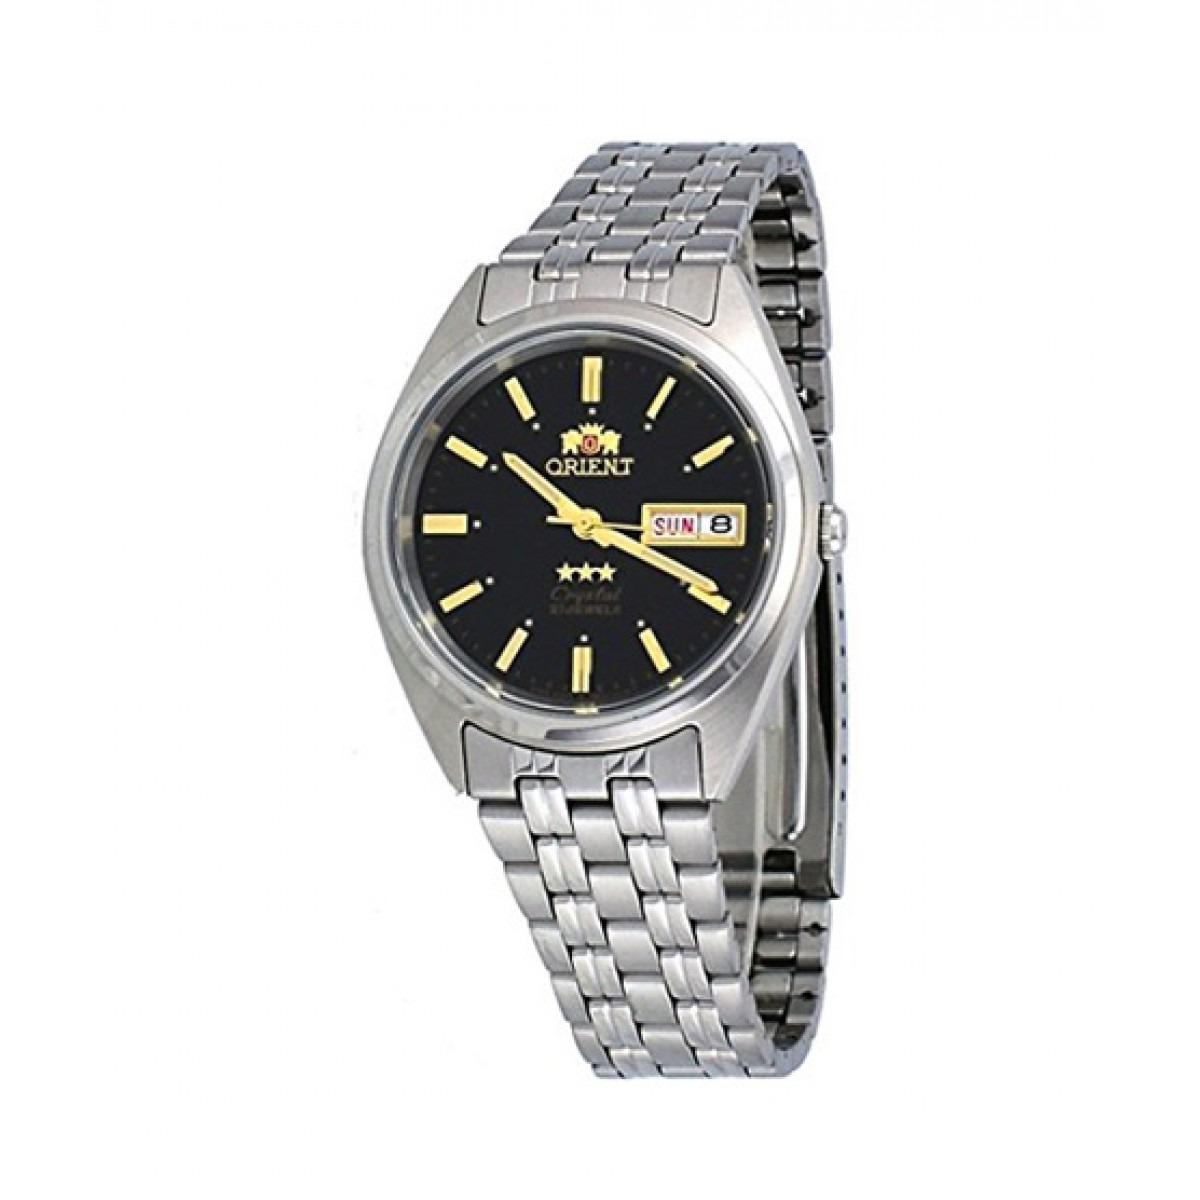 d542bf816958 reloj orient para hombre modelo  fab0000db9 envio gratis. Cargando zoom.